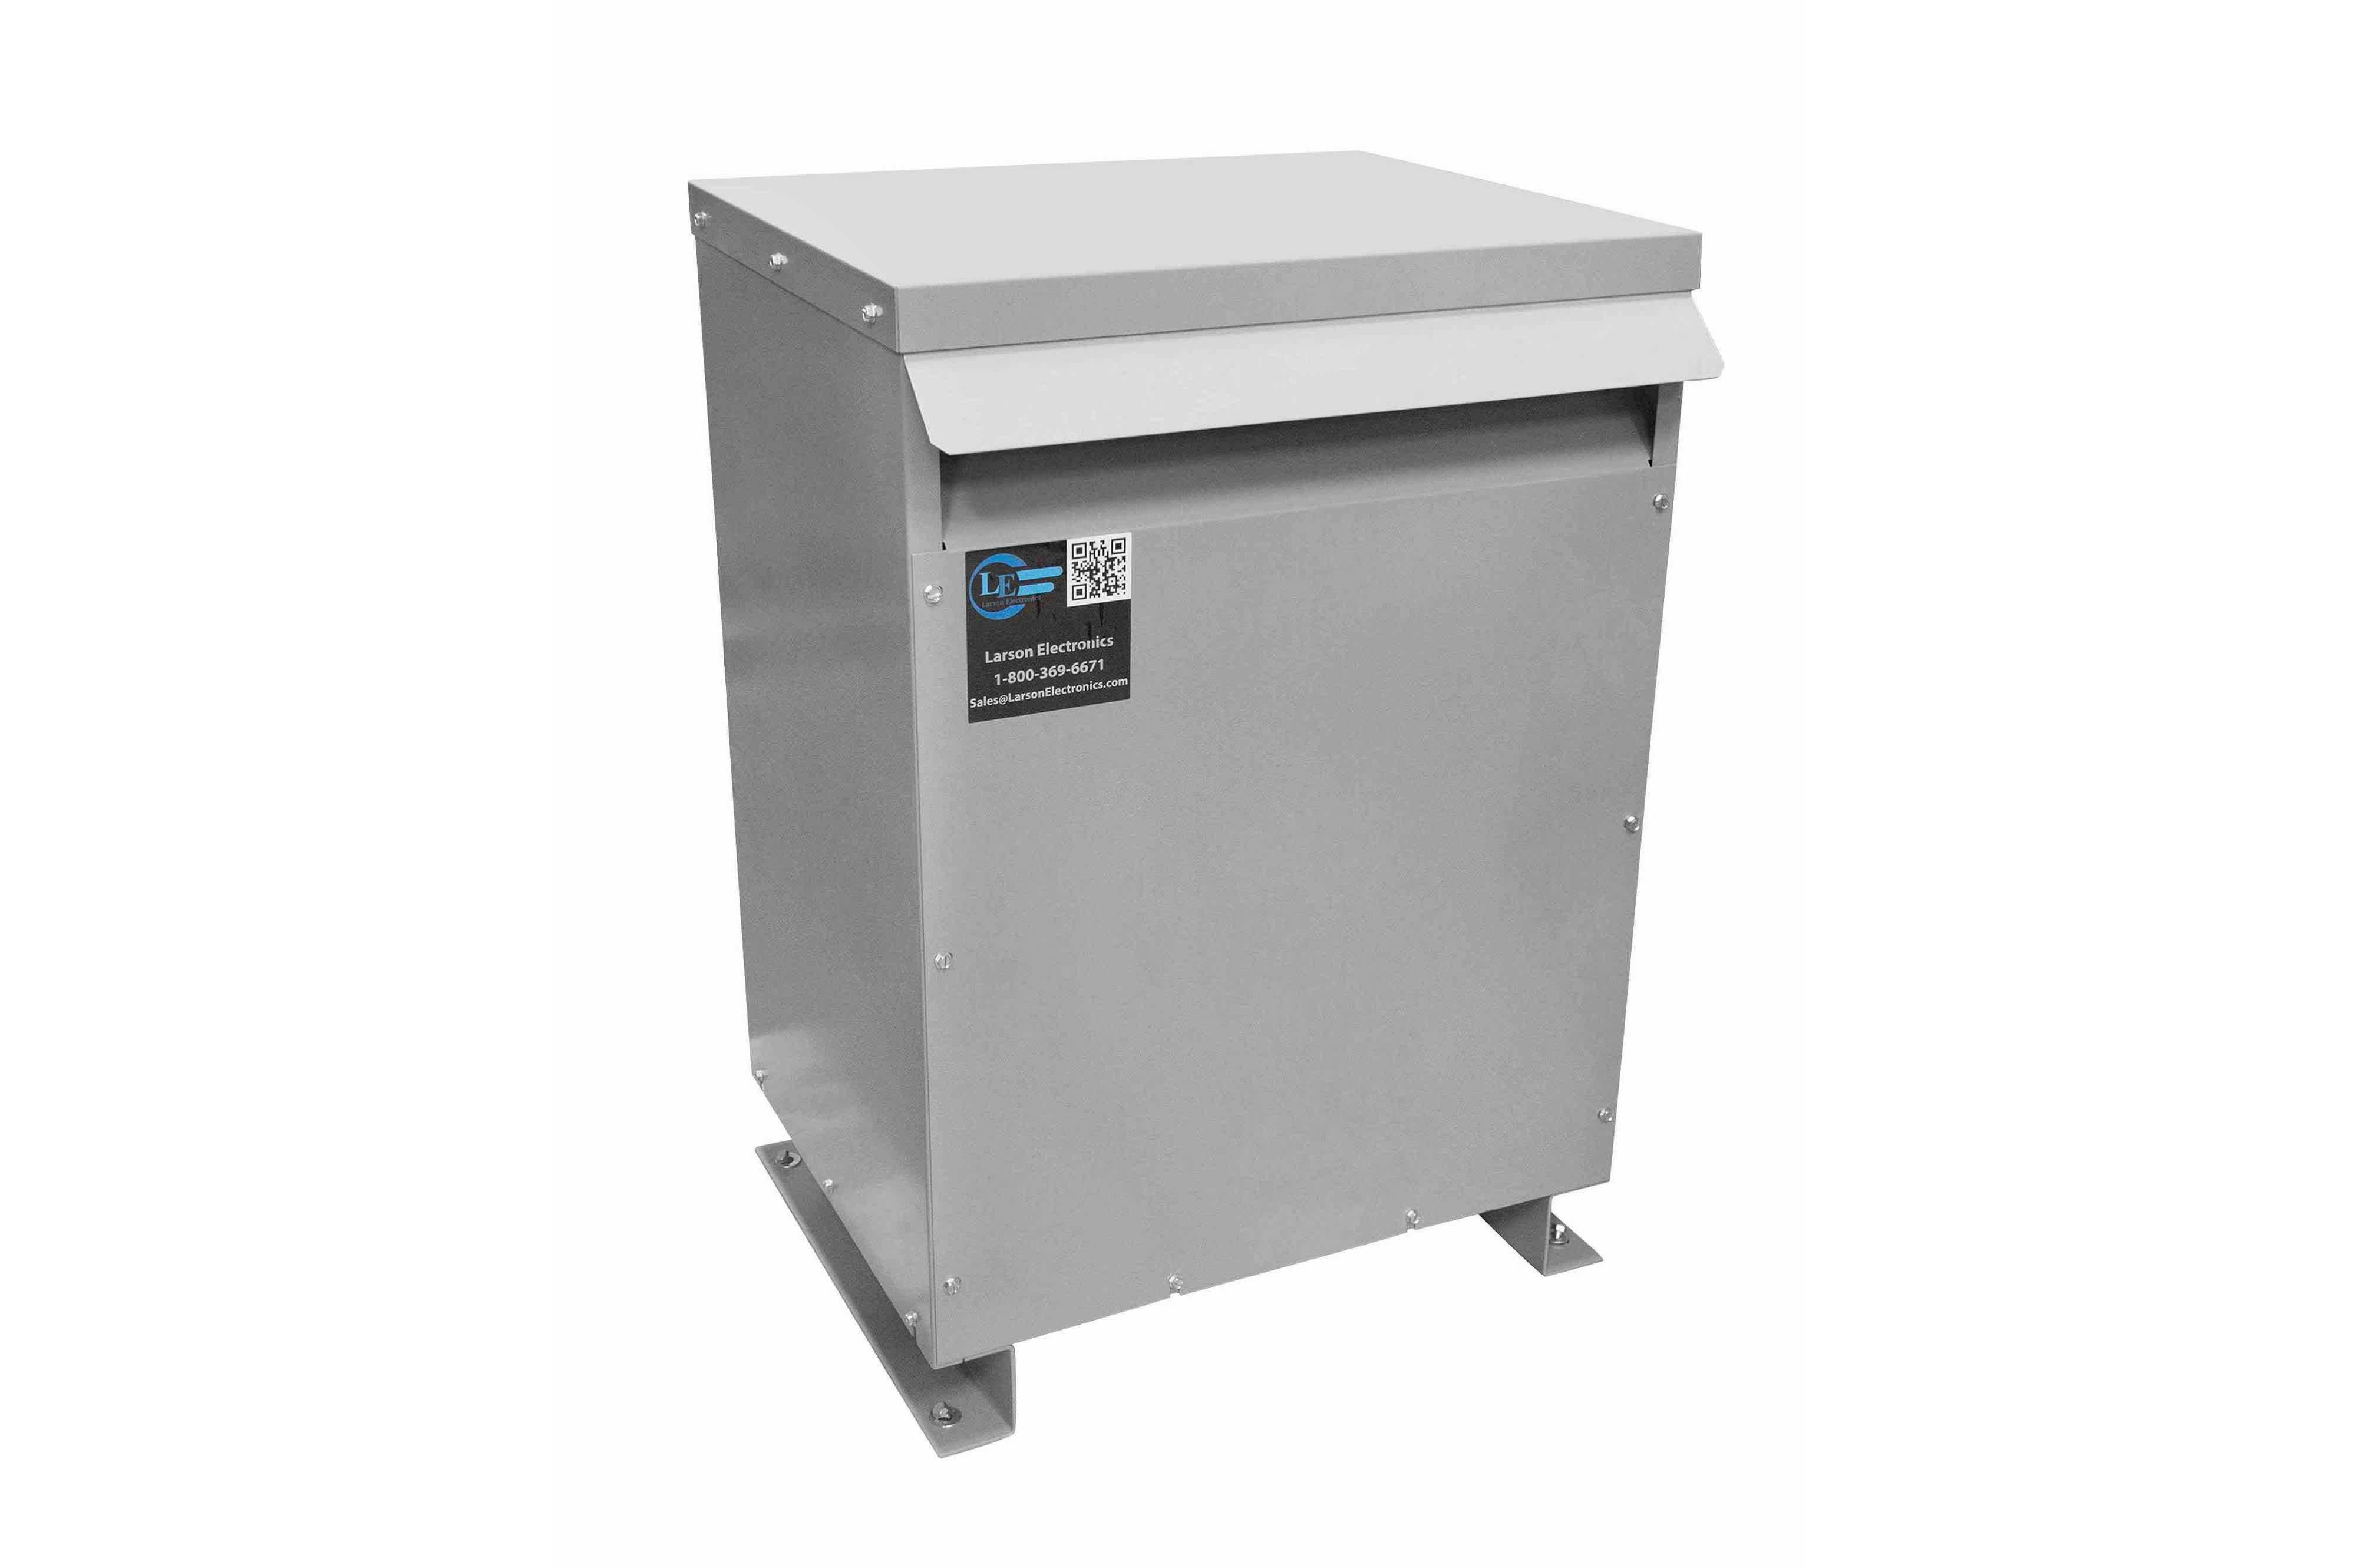 225 kVA 3PH Isolation Transformer, 240V Wye Primary, 380V Delta Secondary, N3R, Ventilated, 60 Hz